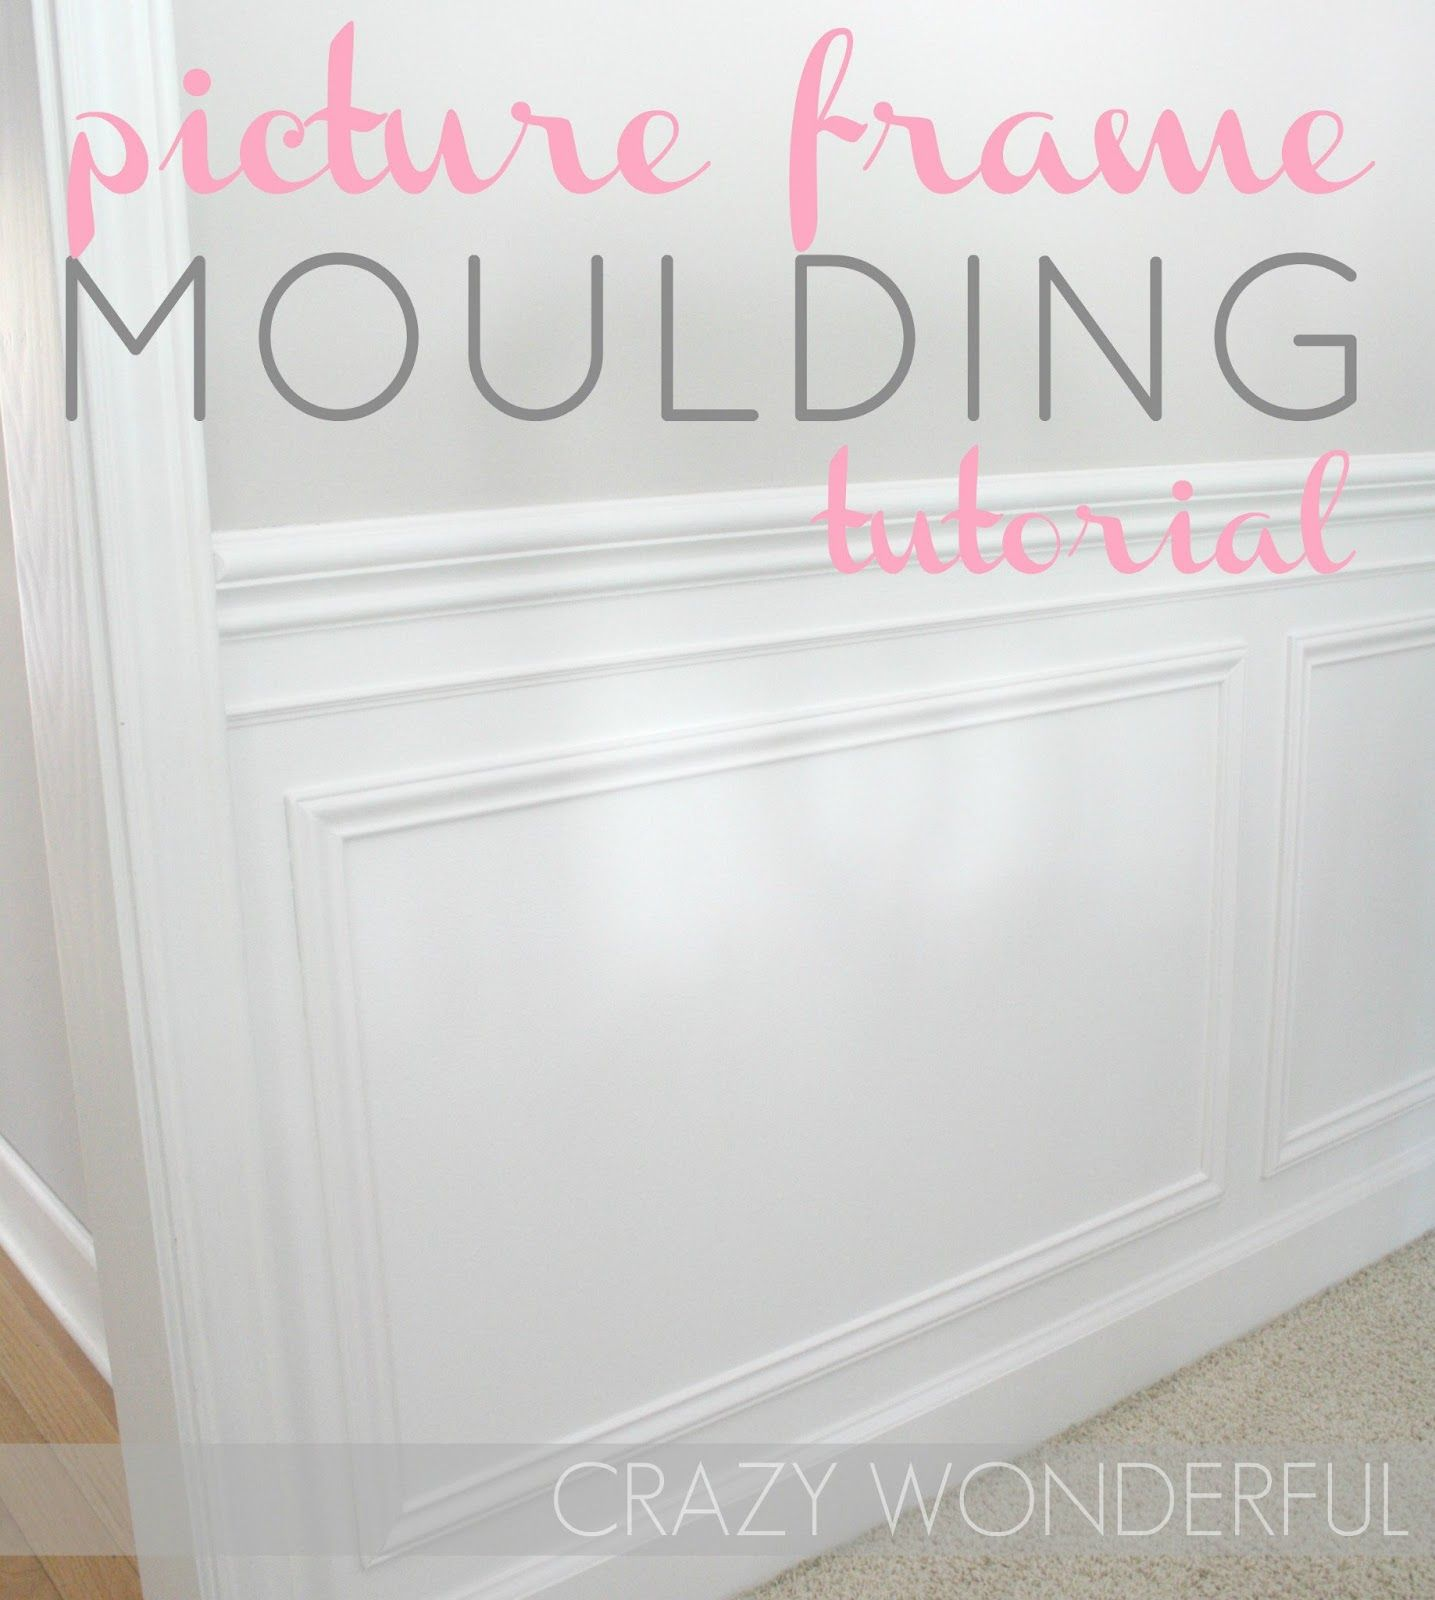 Crazy wonderful picture frame moulding tutorial also bathroom ideas rh pinterest